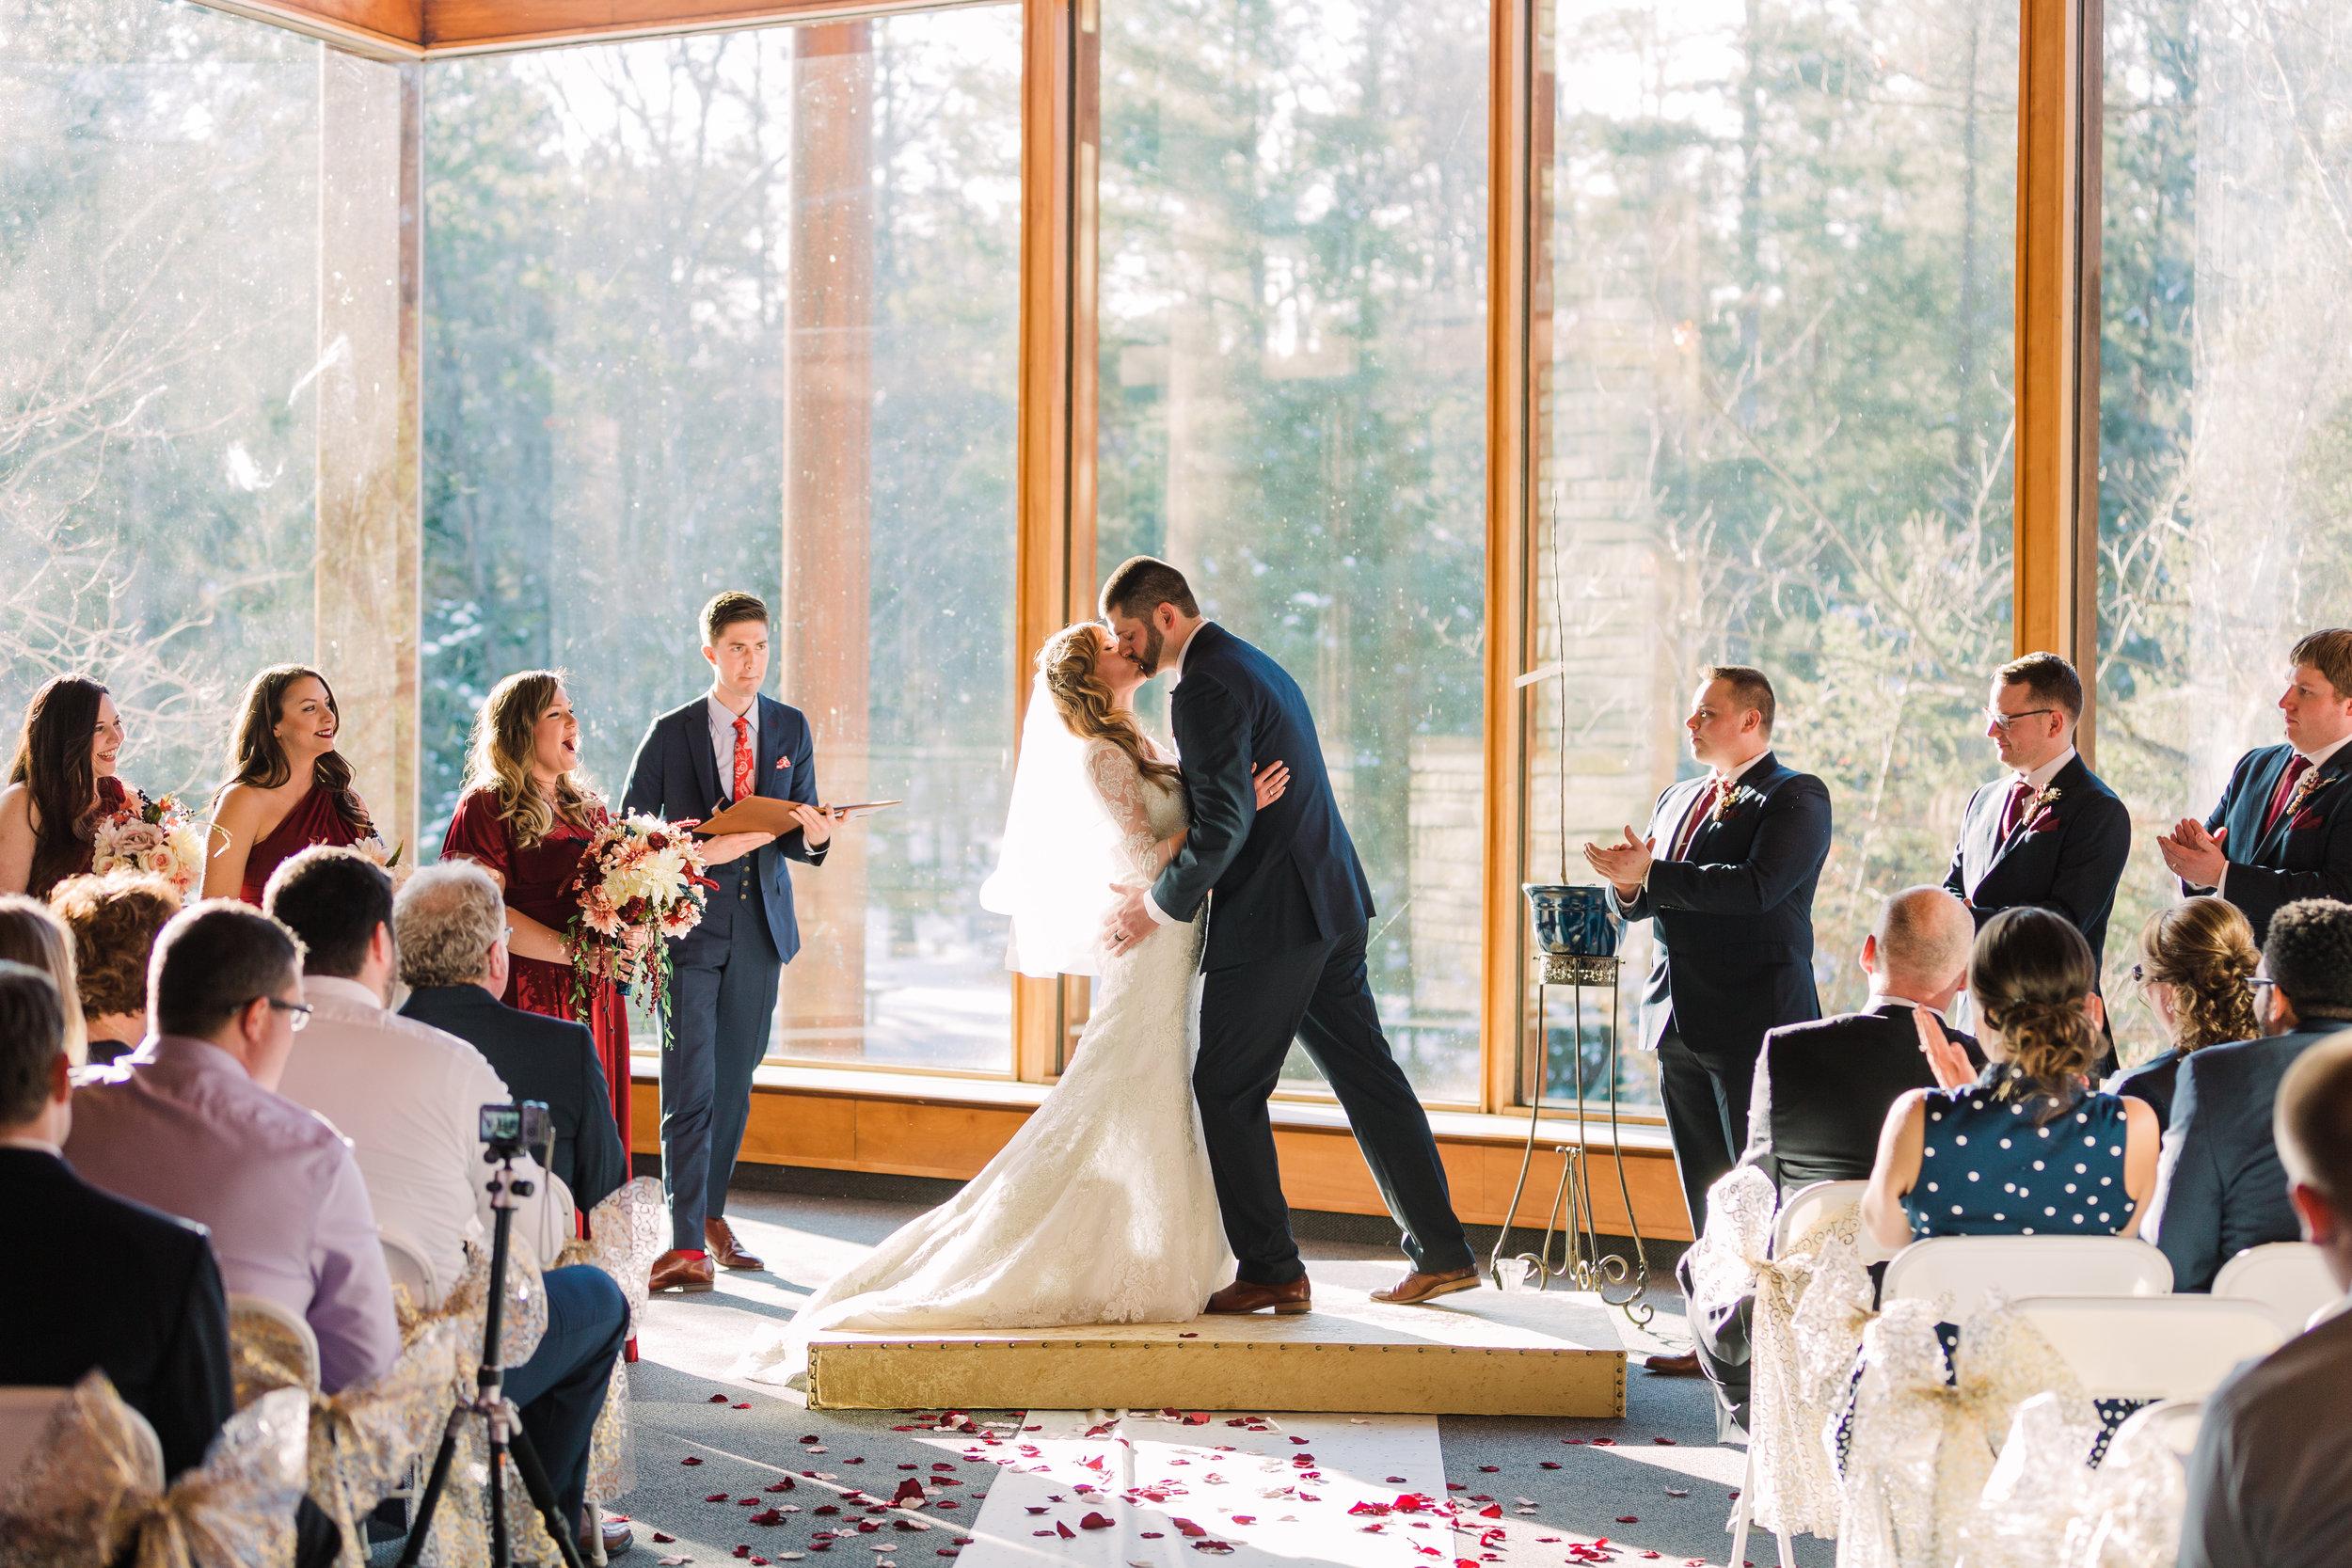 Traverse_city_wedding_photographer_rockhill_blacklake_UAW_michigan_JJ1a.jpg